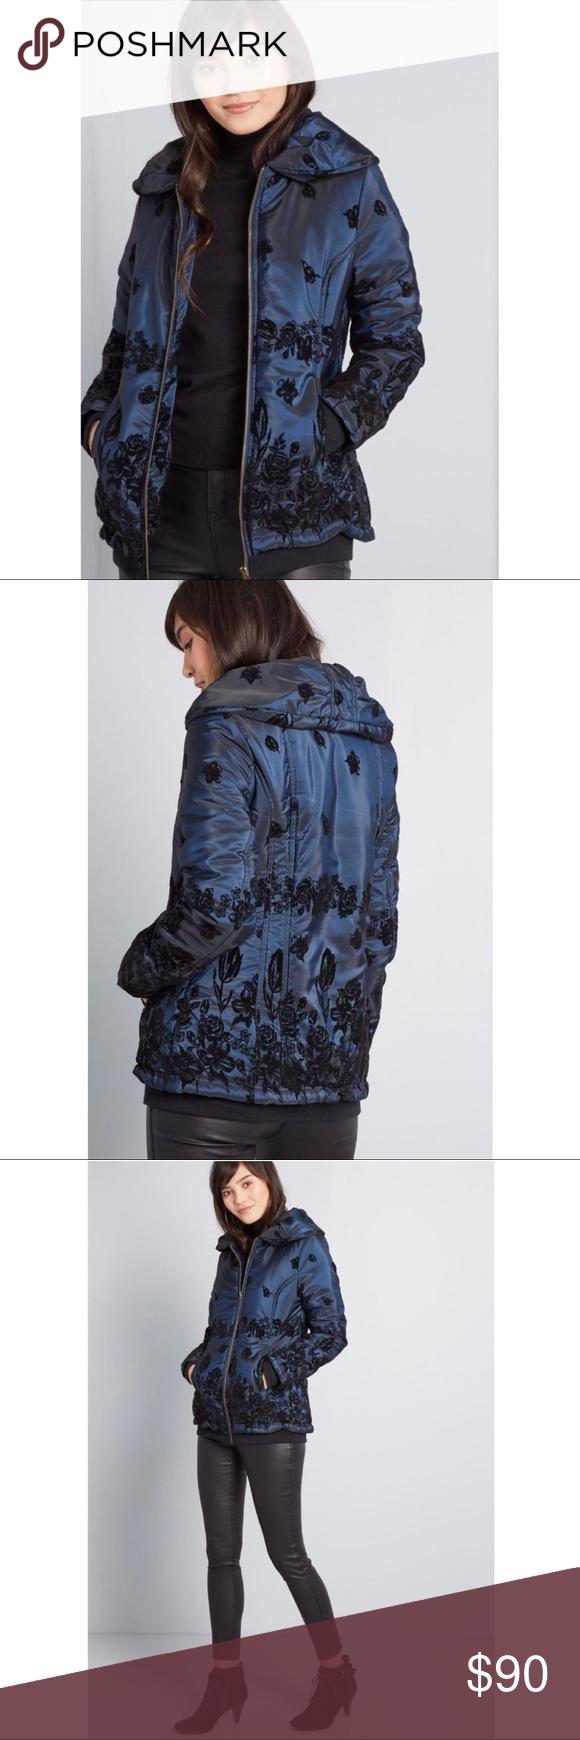 Plus Size Modcloth Blue Velvet Puffer Jacket Clothes Design Modcloth Blue Velvet [ 1740 x 580 Pixel ]